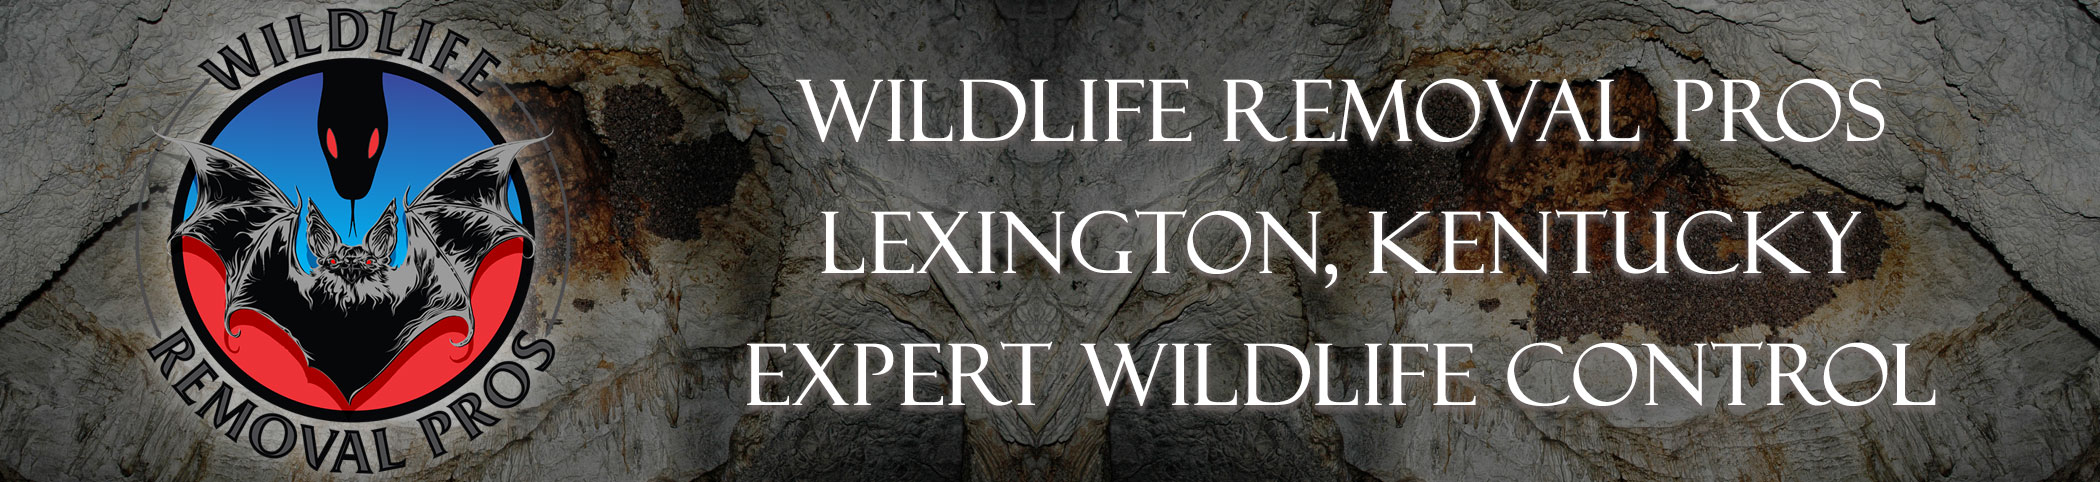 Lexington_kentucky_wildlife_headers